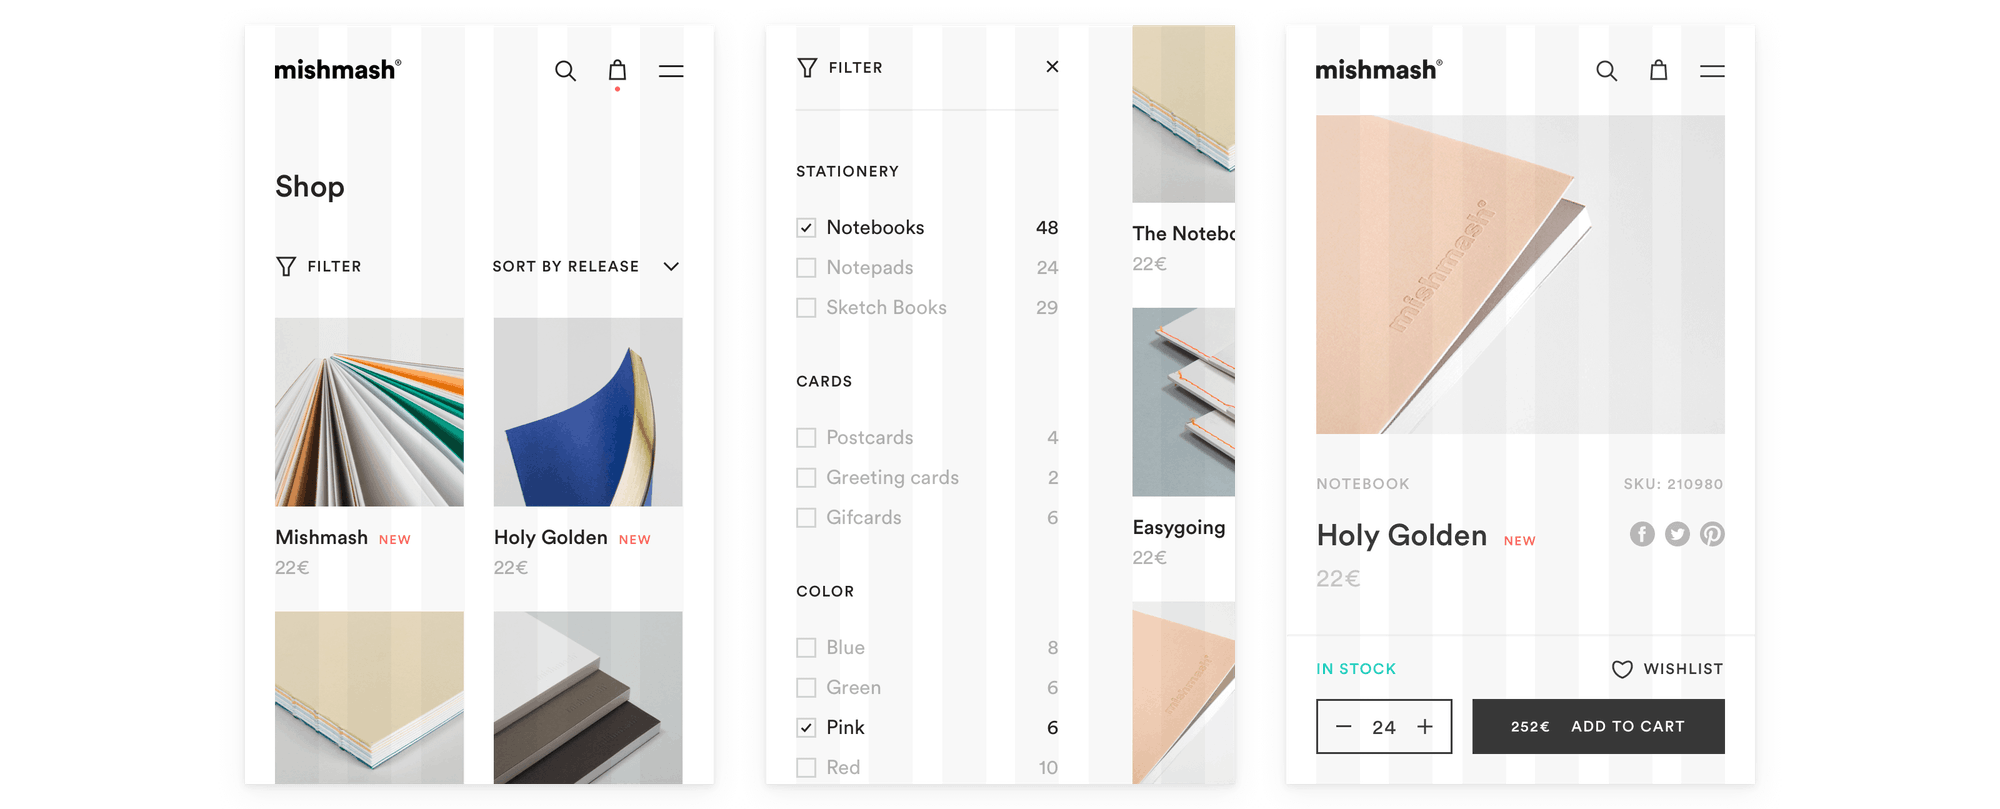 Mishmash Mobile